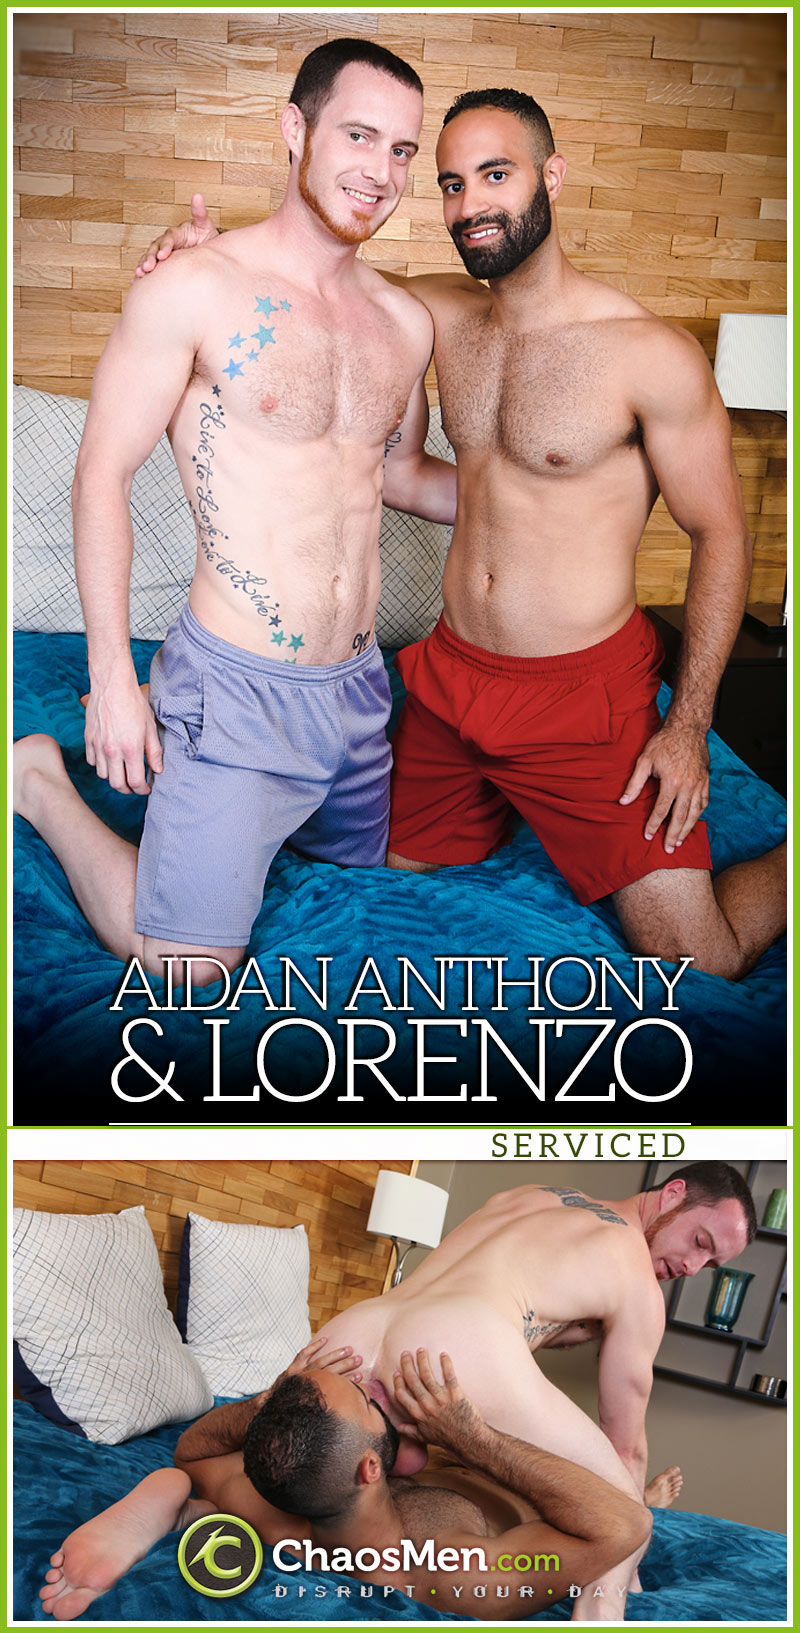 Aidan Anthony & Lorenzo (Serviced) at ChaosMen